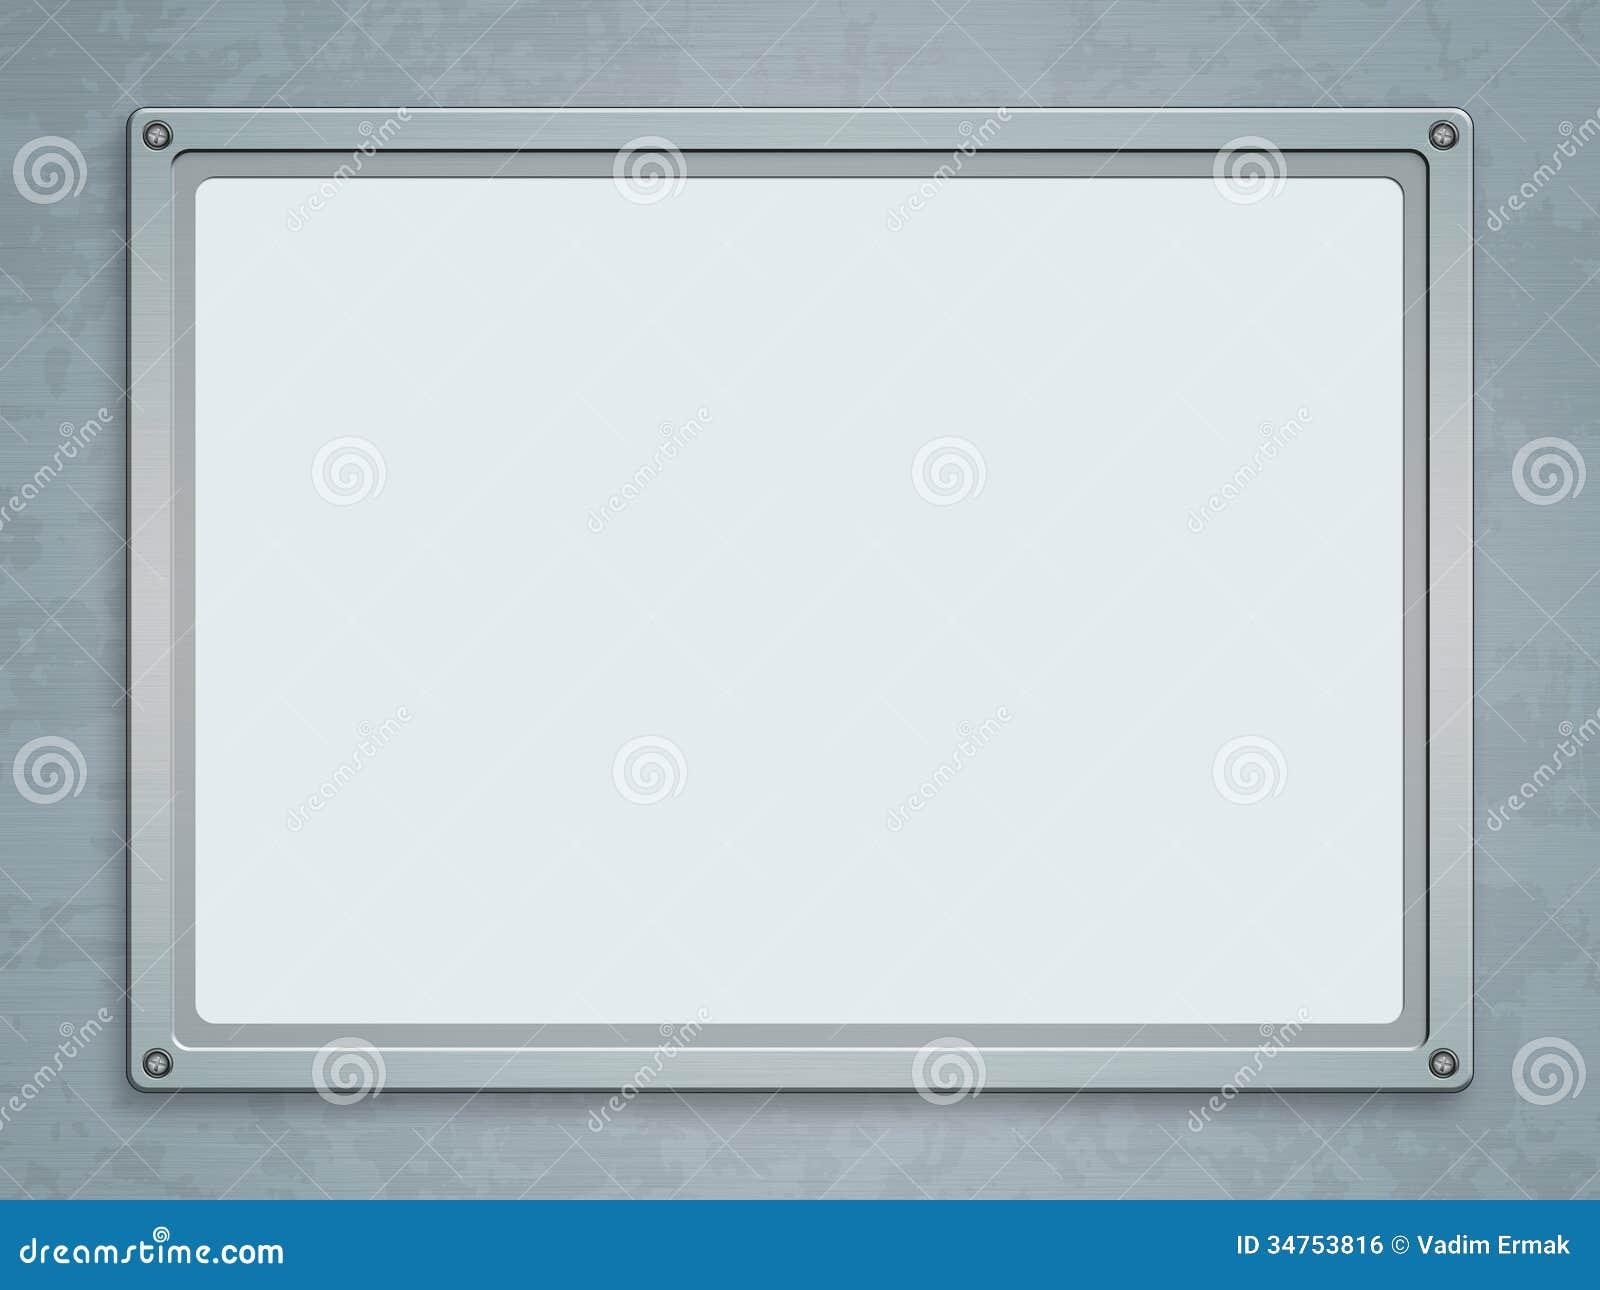 how to make metal frame